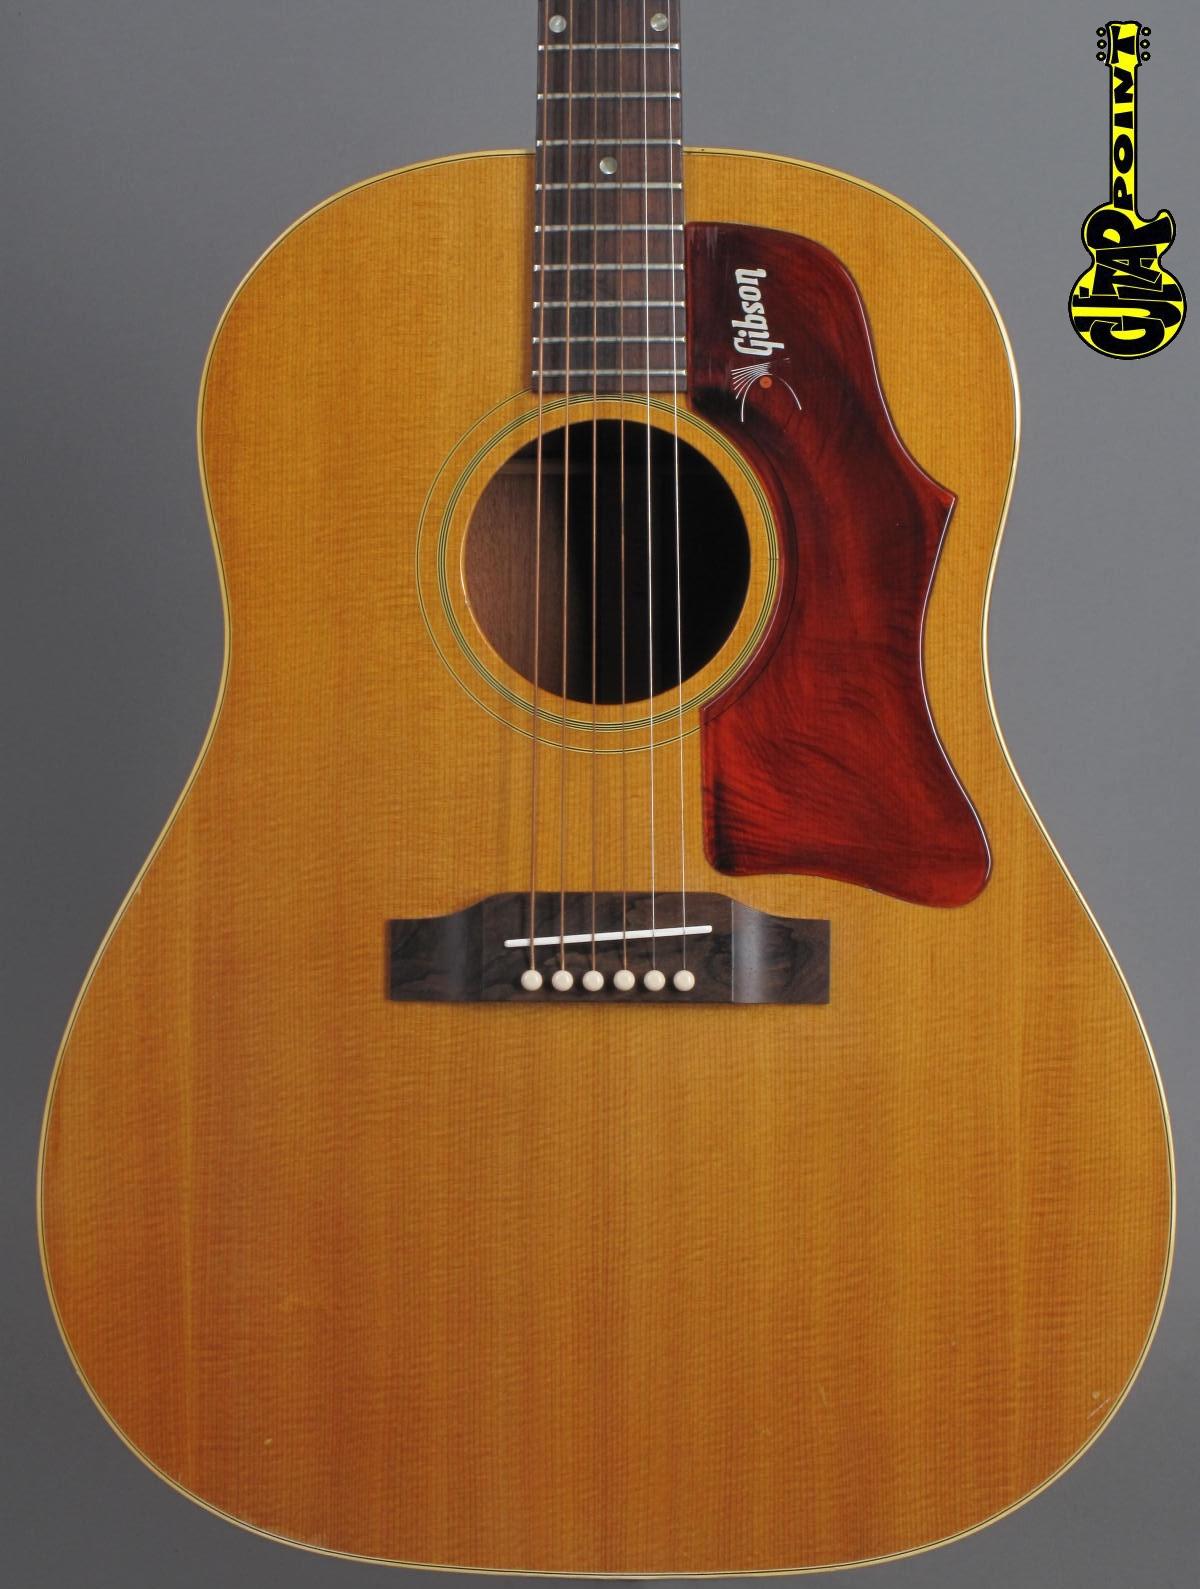 1968 Gibson J-50 - Natural